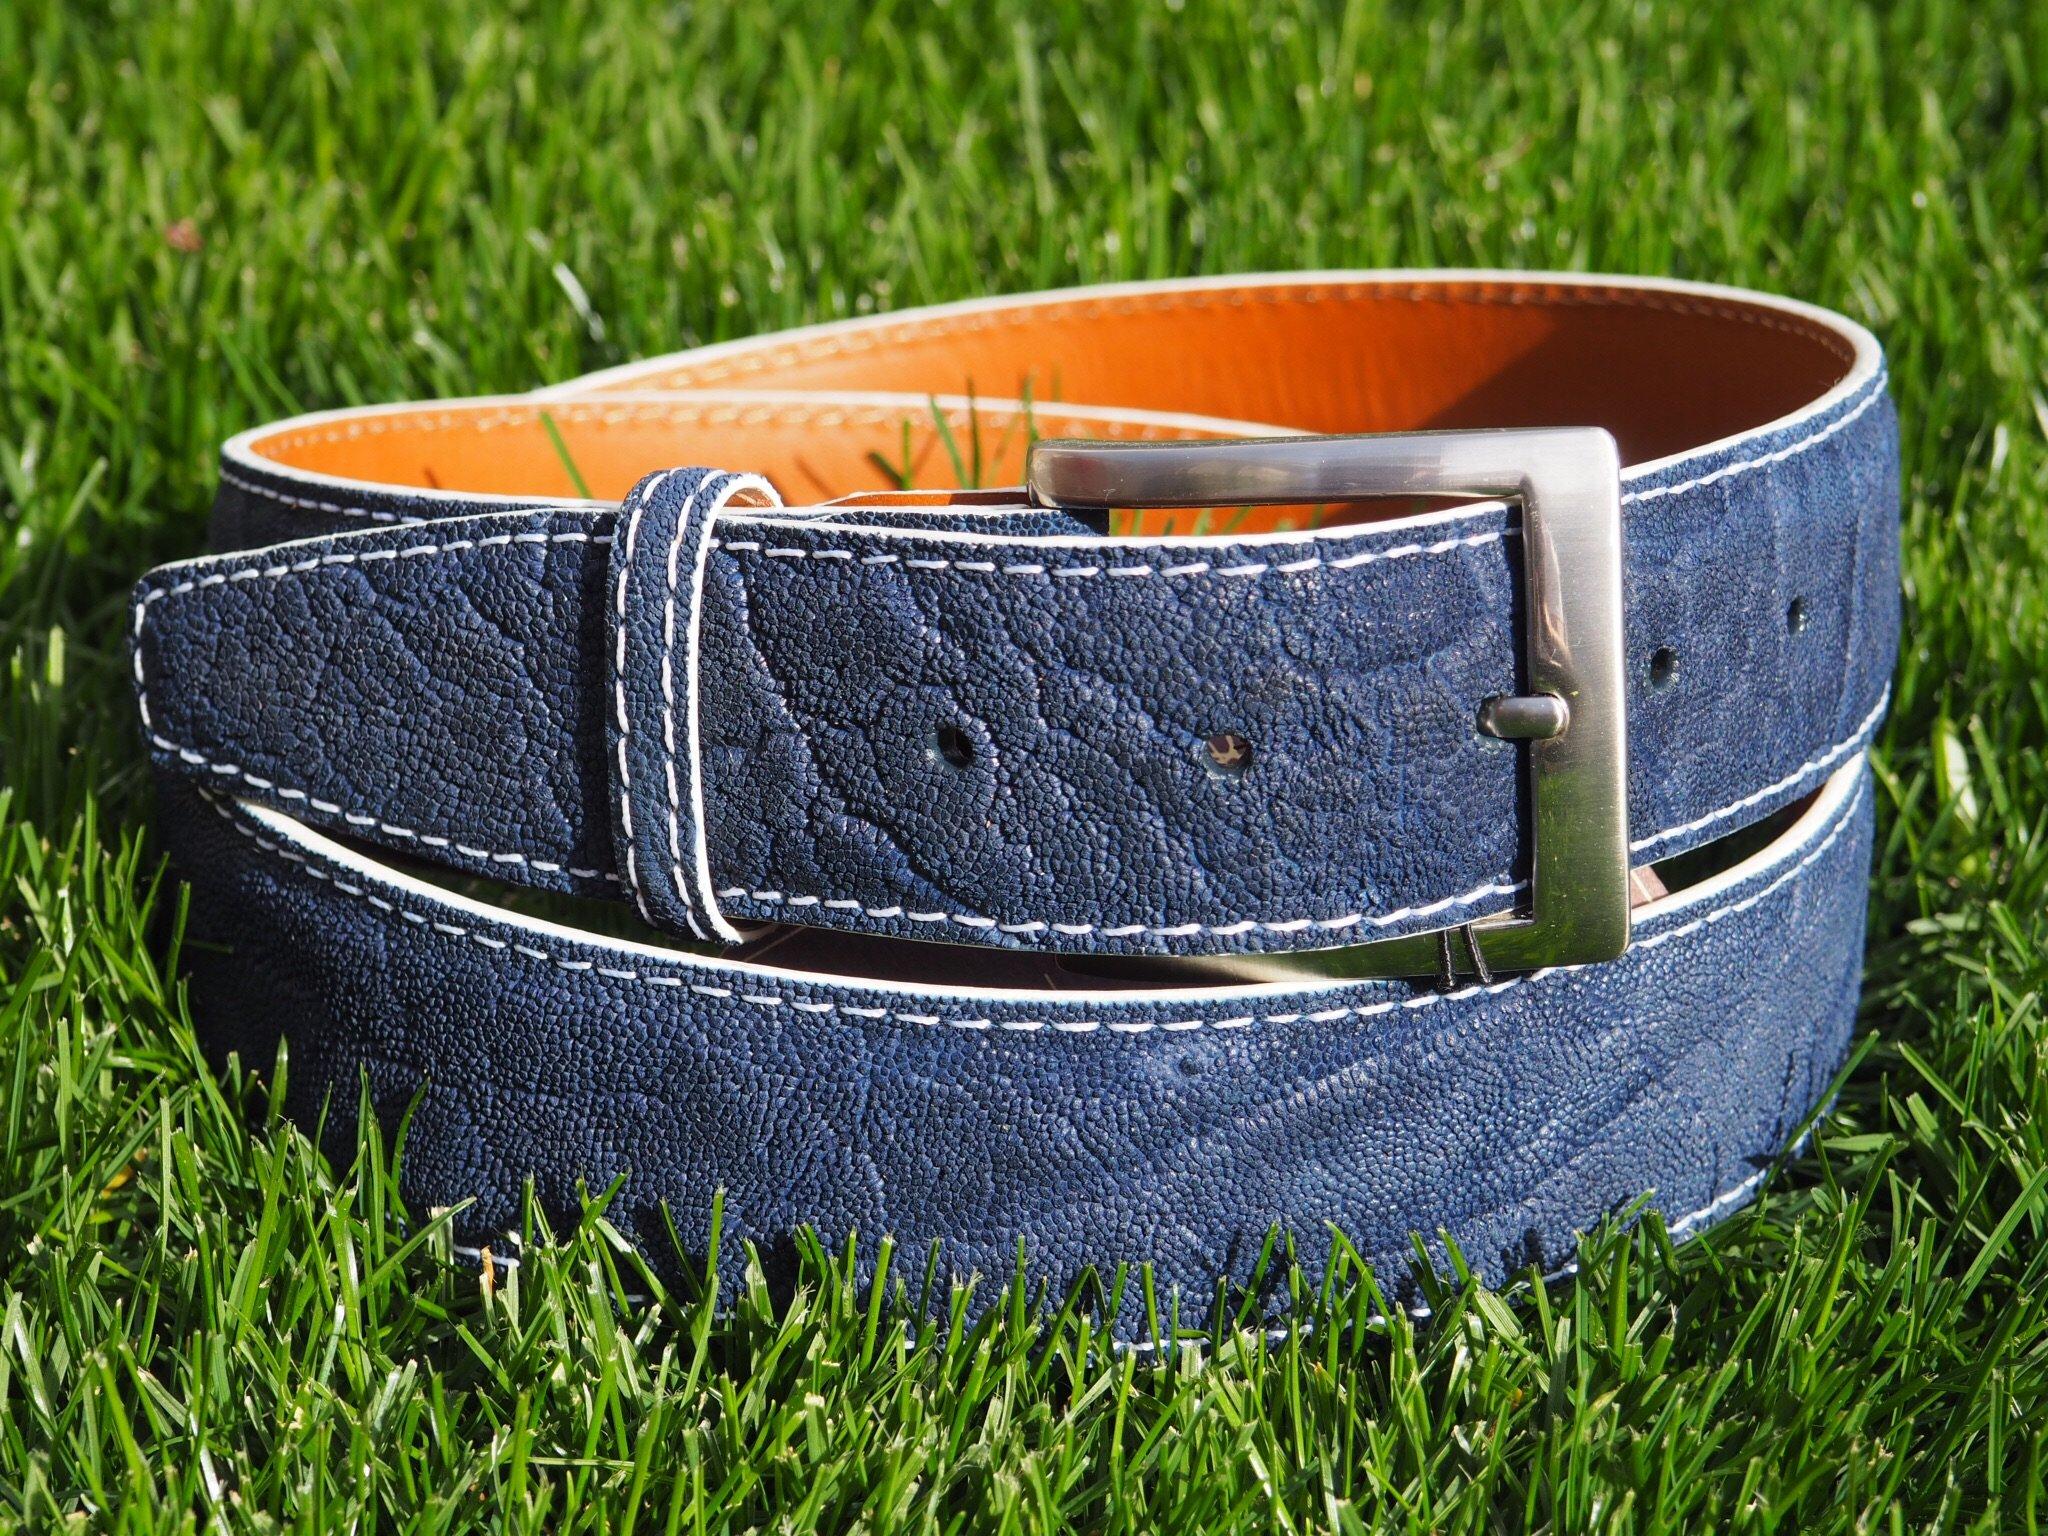 Francis Edward belts